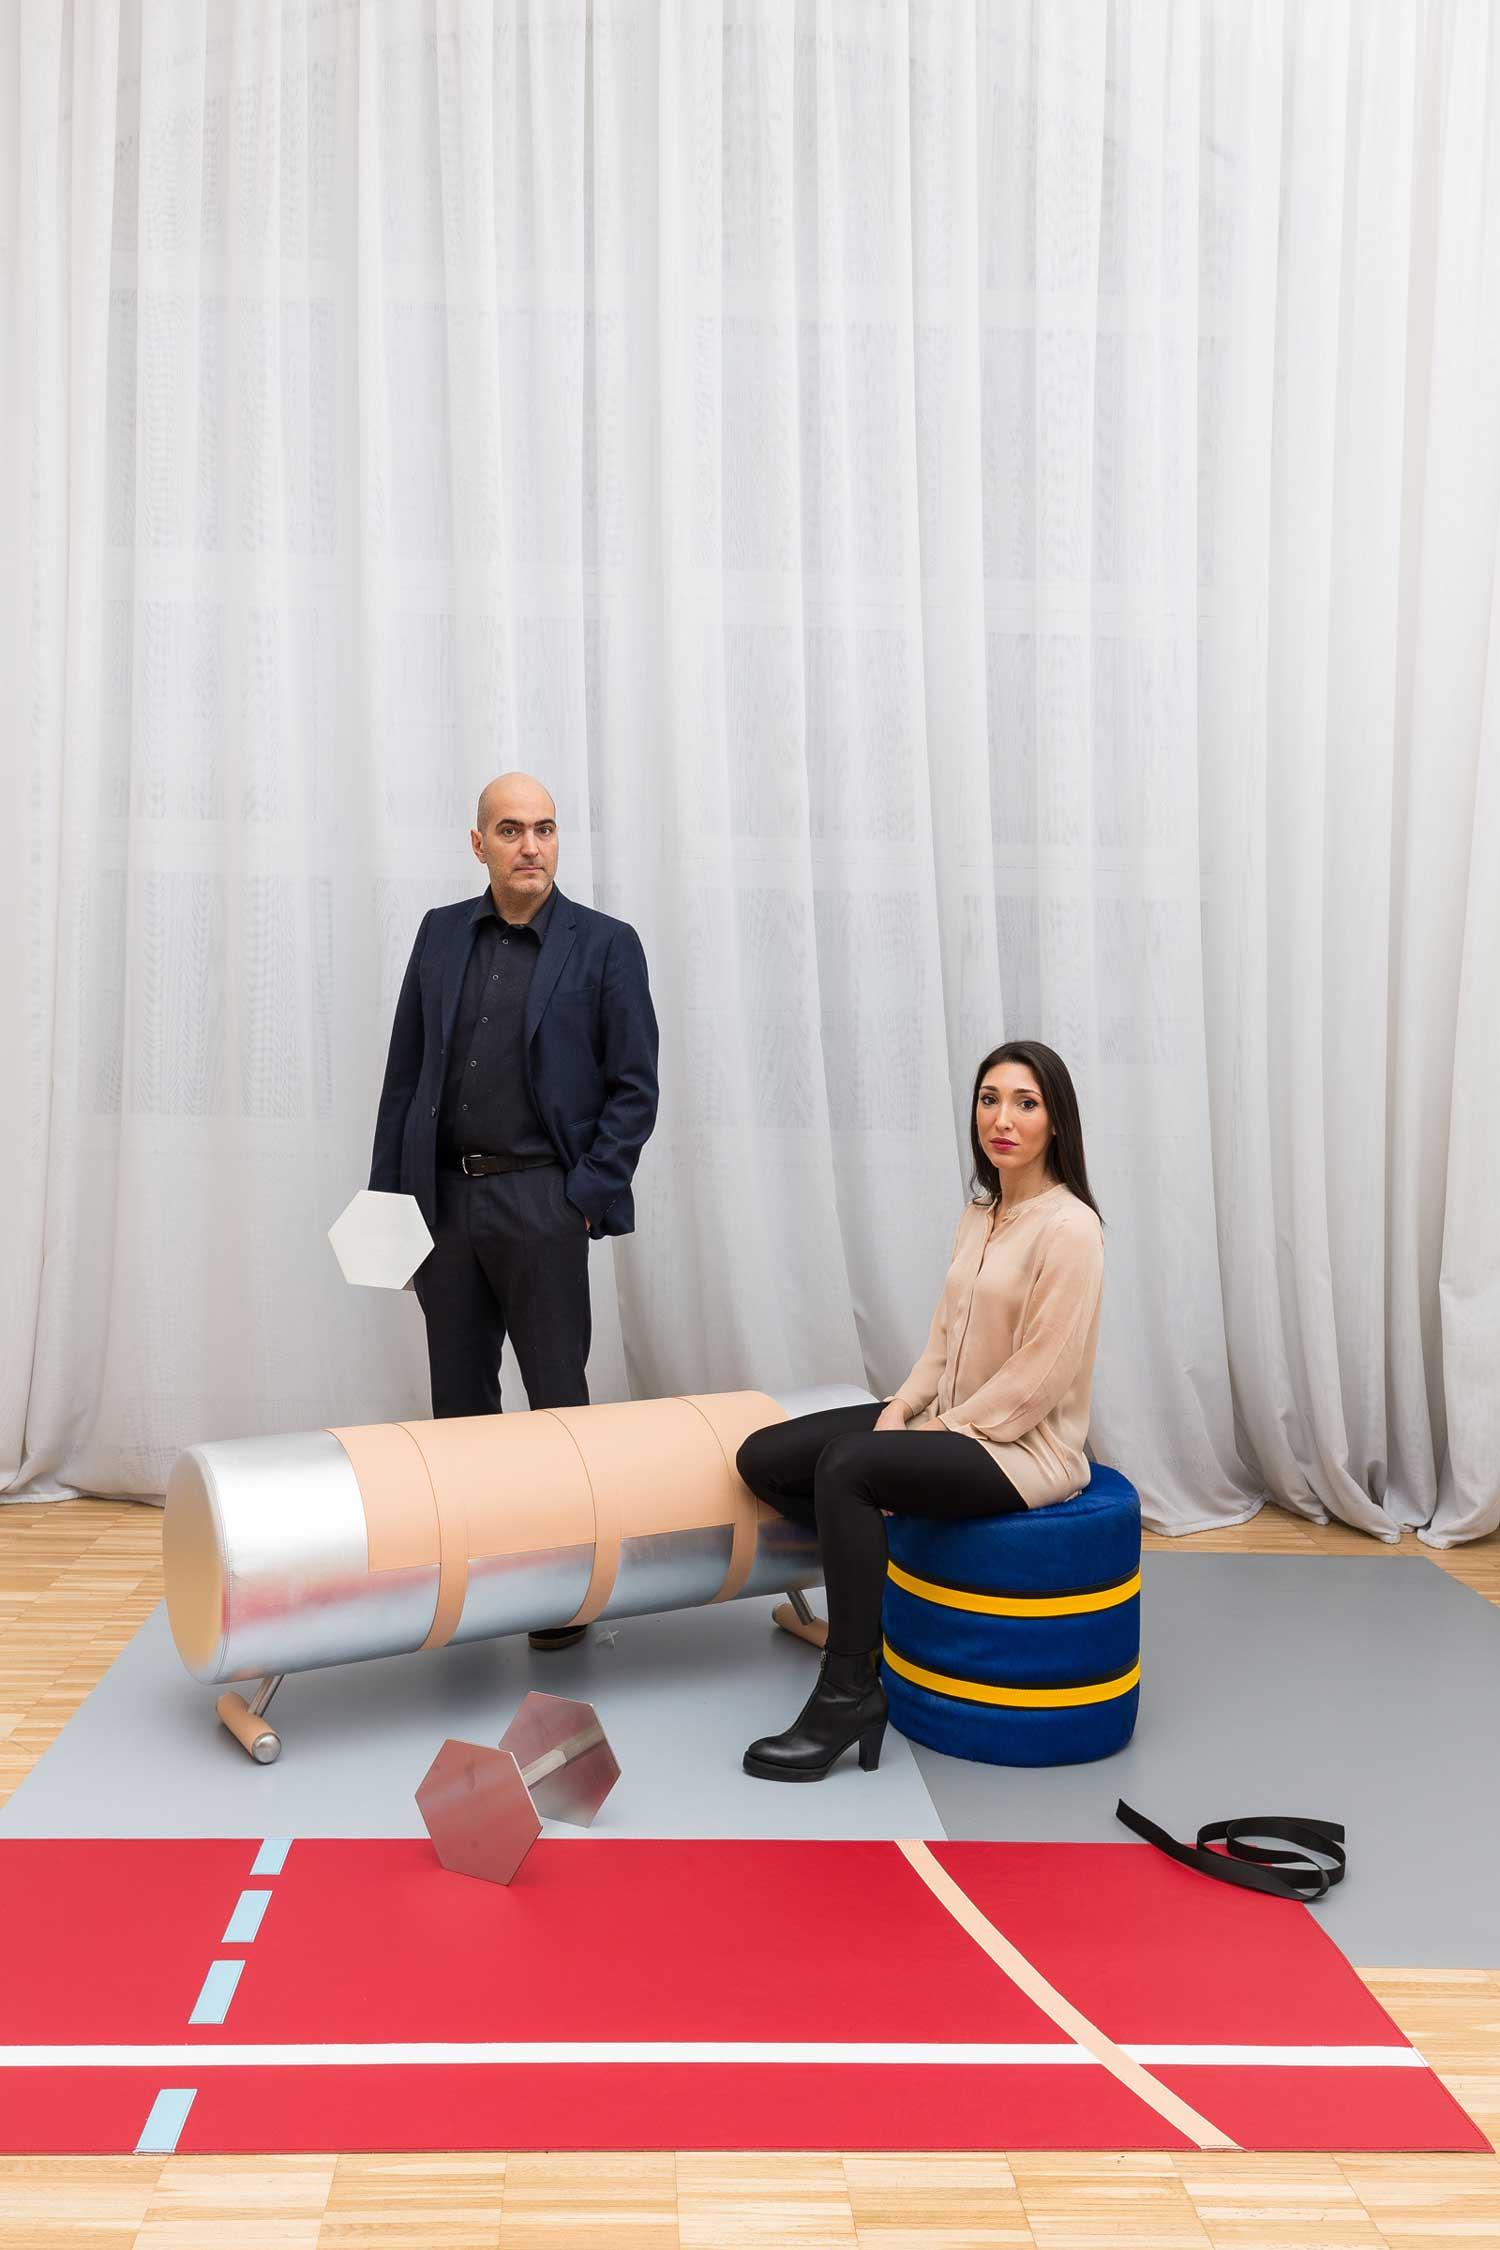 Body Building Portrait Biagetti & Baldassari | Yellowtrace